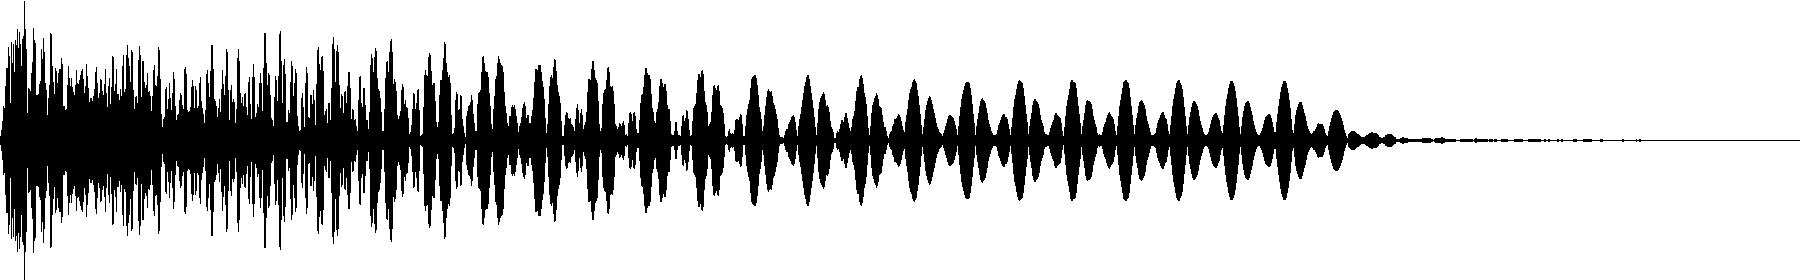 vedh bass cut 069 g